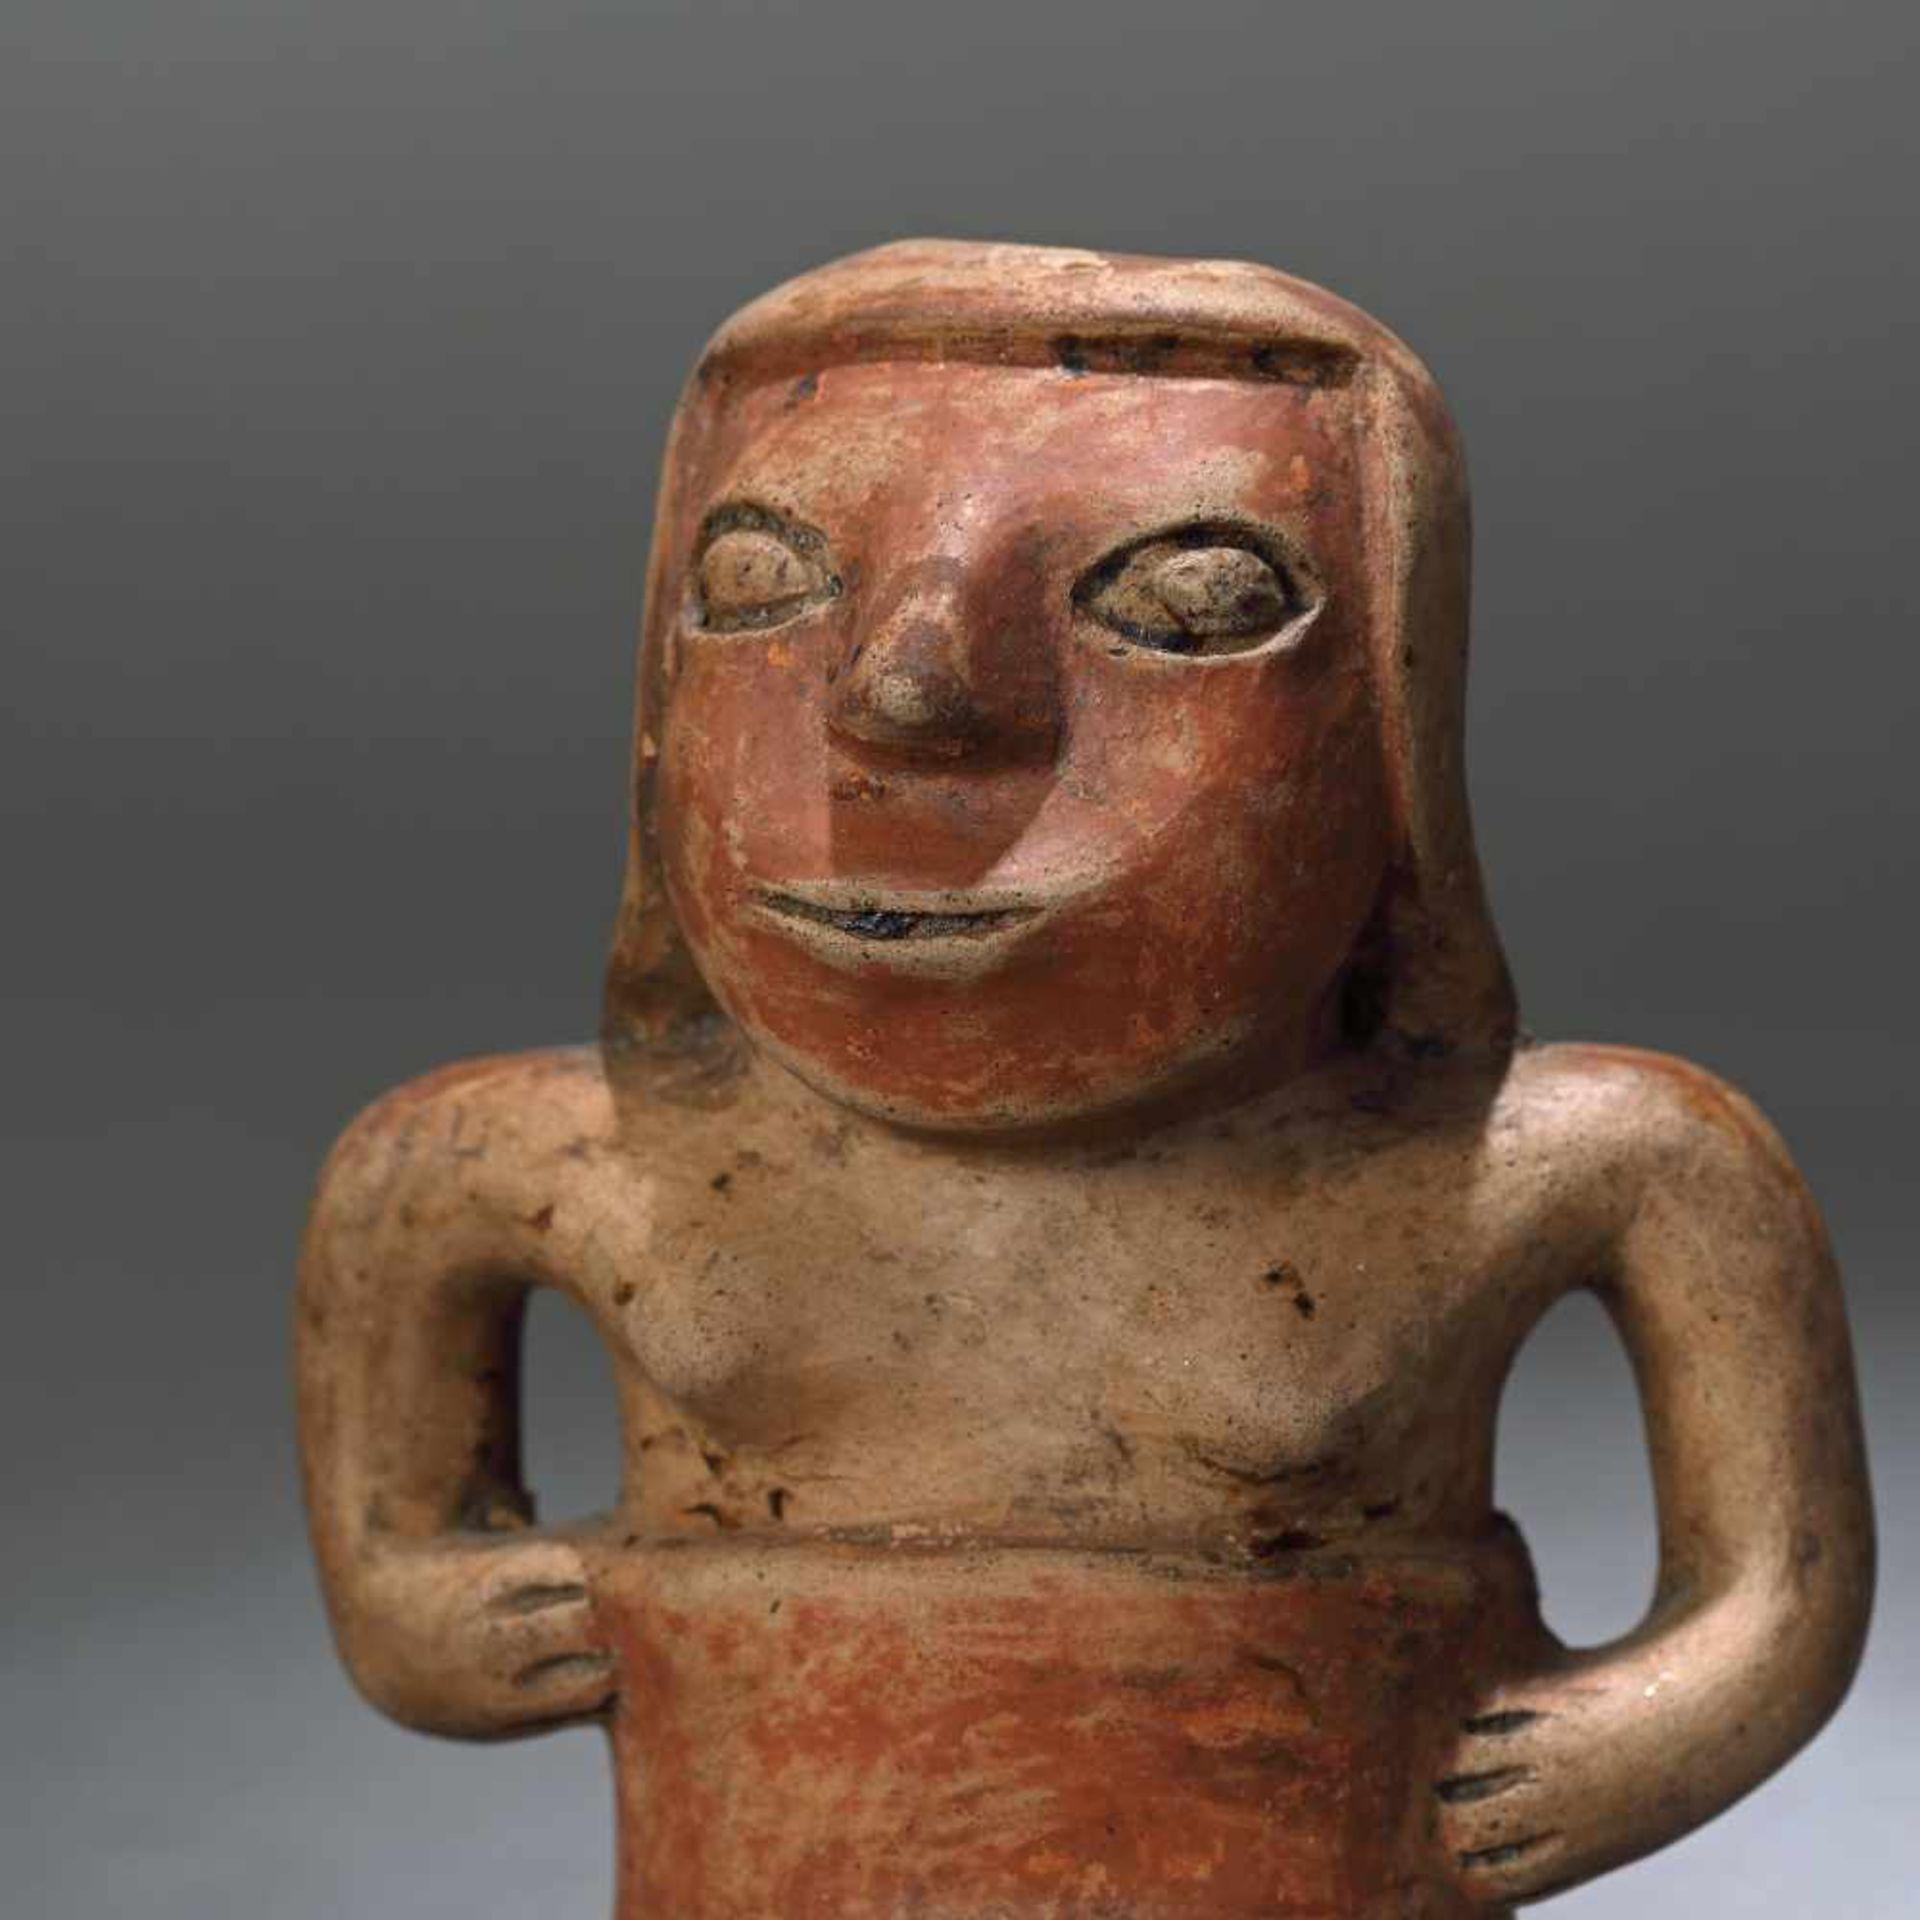 Ceramic statuette, depicting a female figure, Narino culture, Columbia, approx. 1,750 years old, 3rd - Bild 2 aus 6